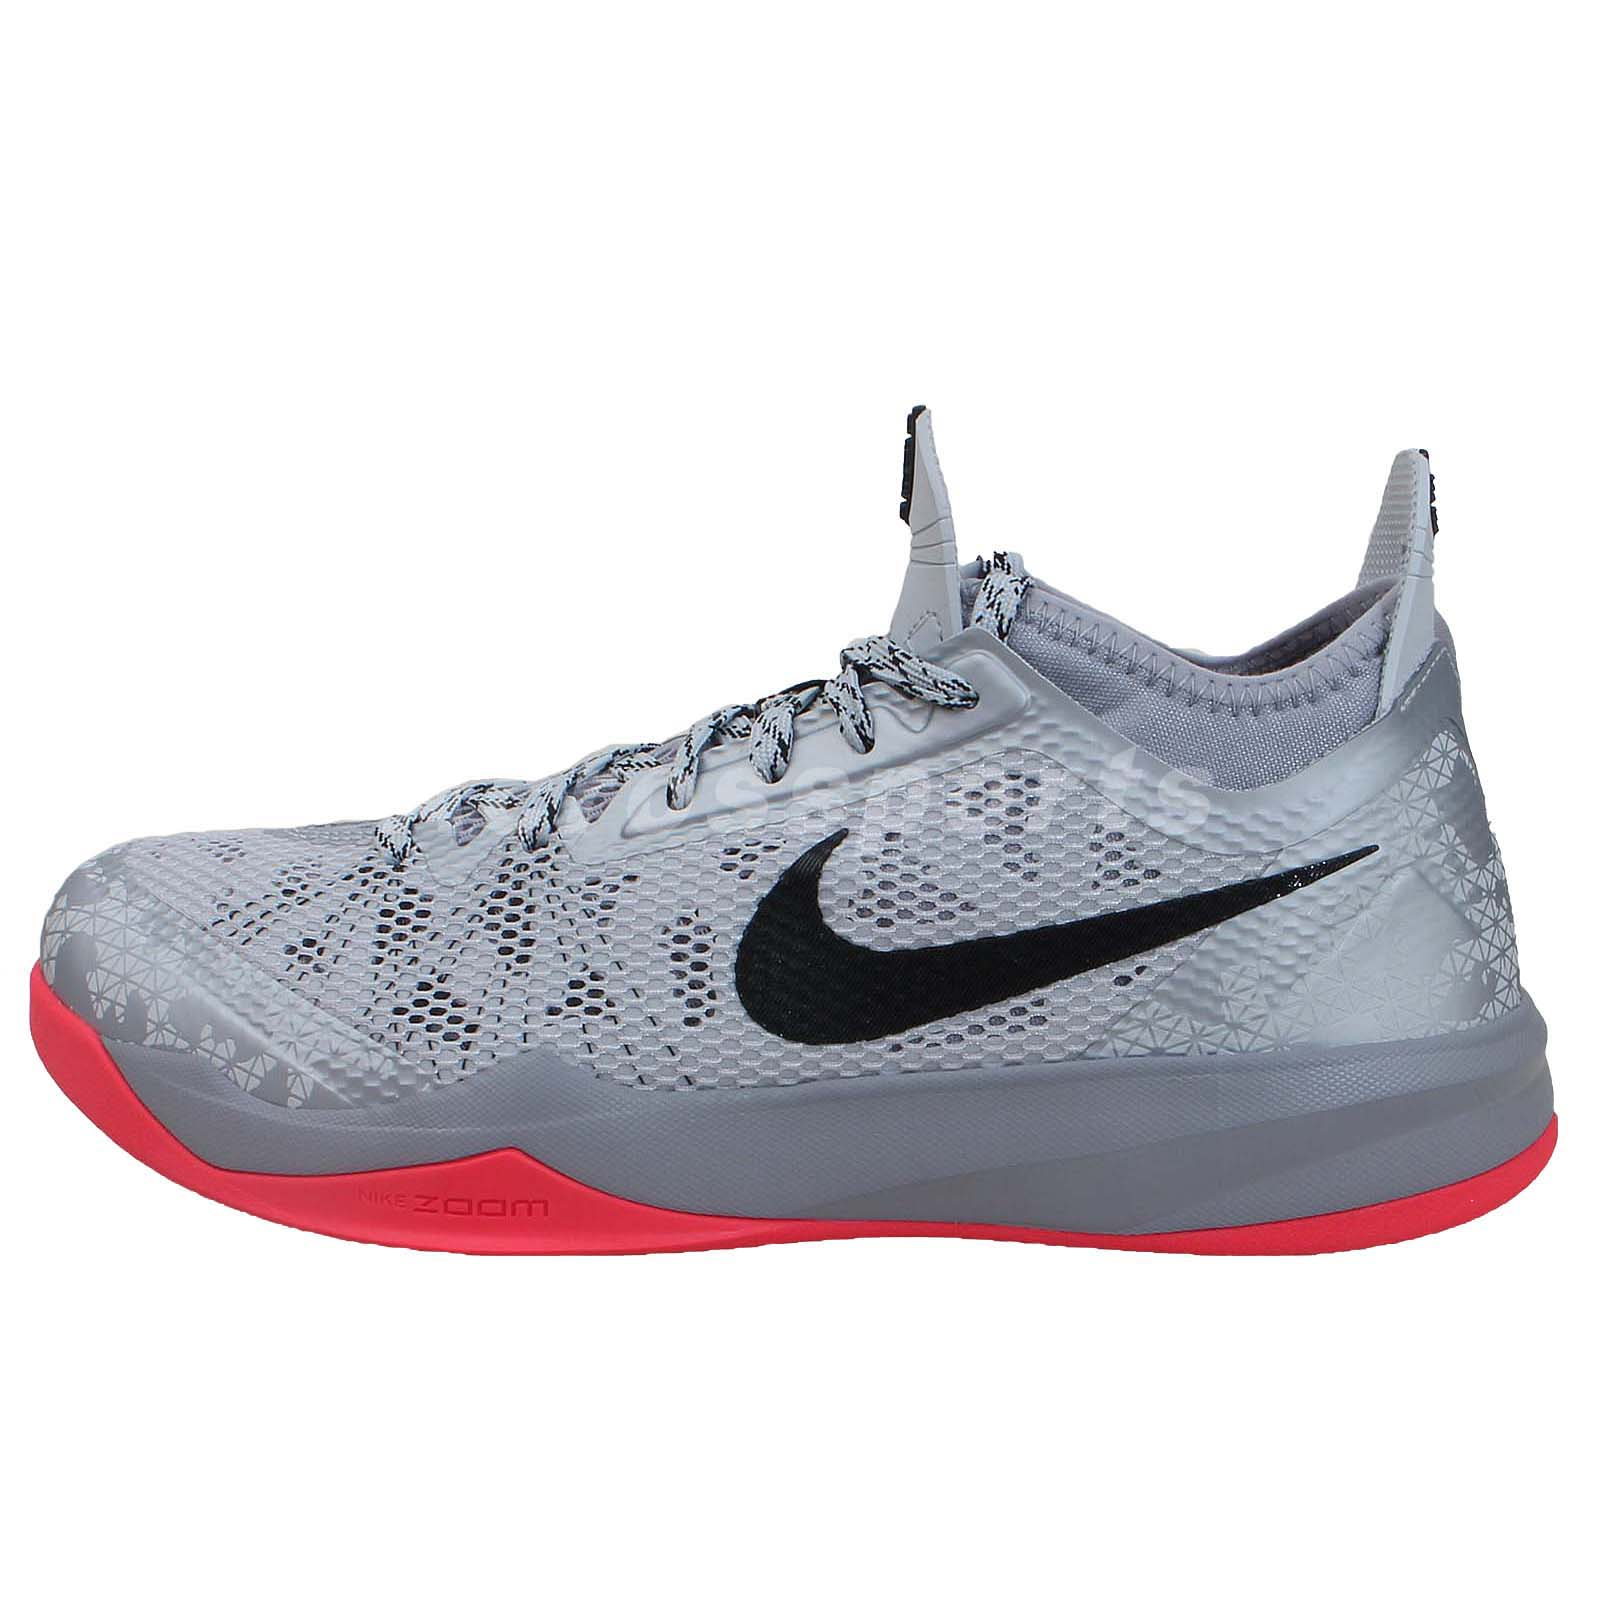 James Harden Gold Shoes: Nike Zoom Crusader Outdoor XDR Silver 2014 James Harden